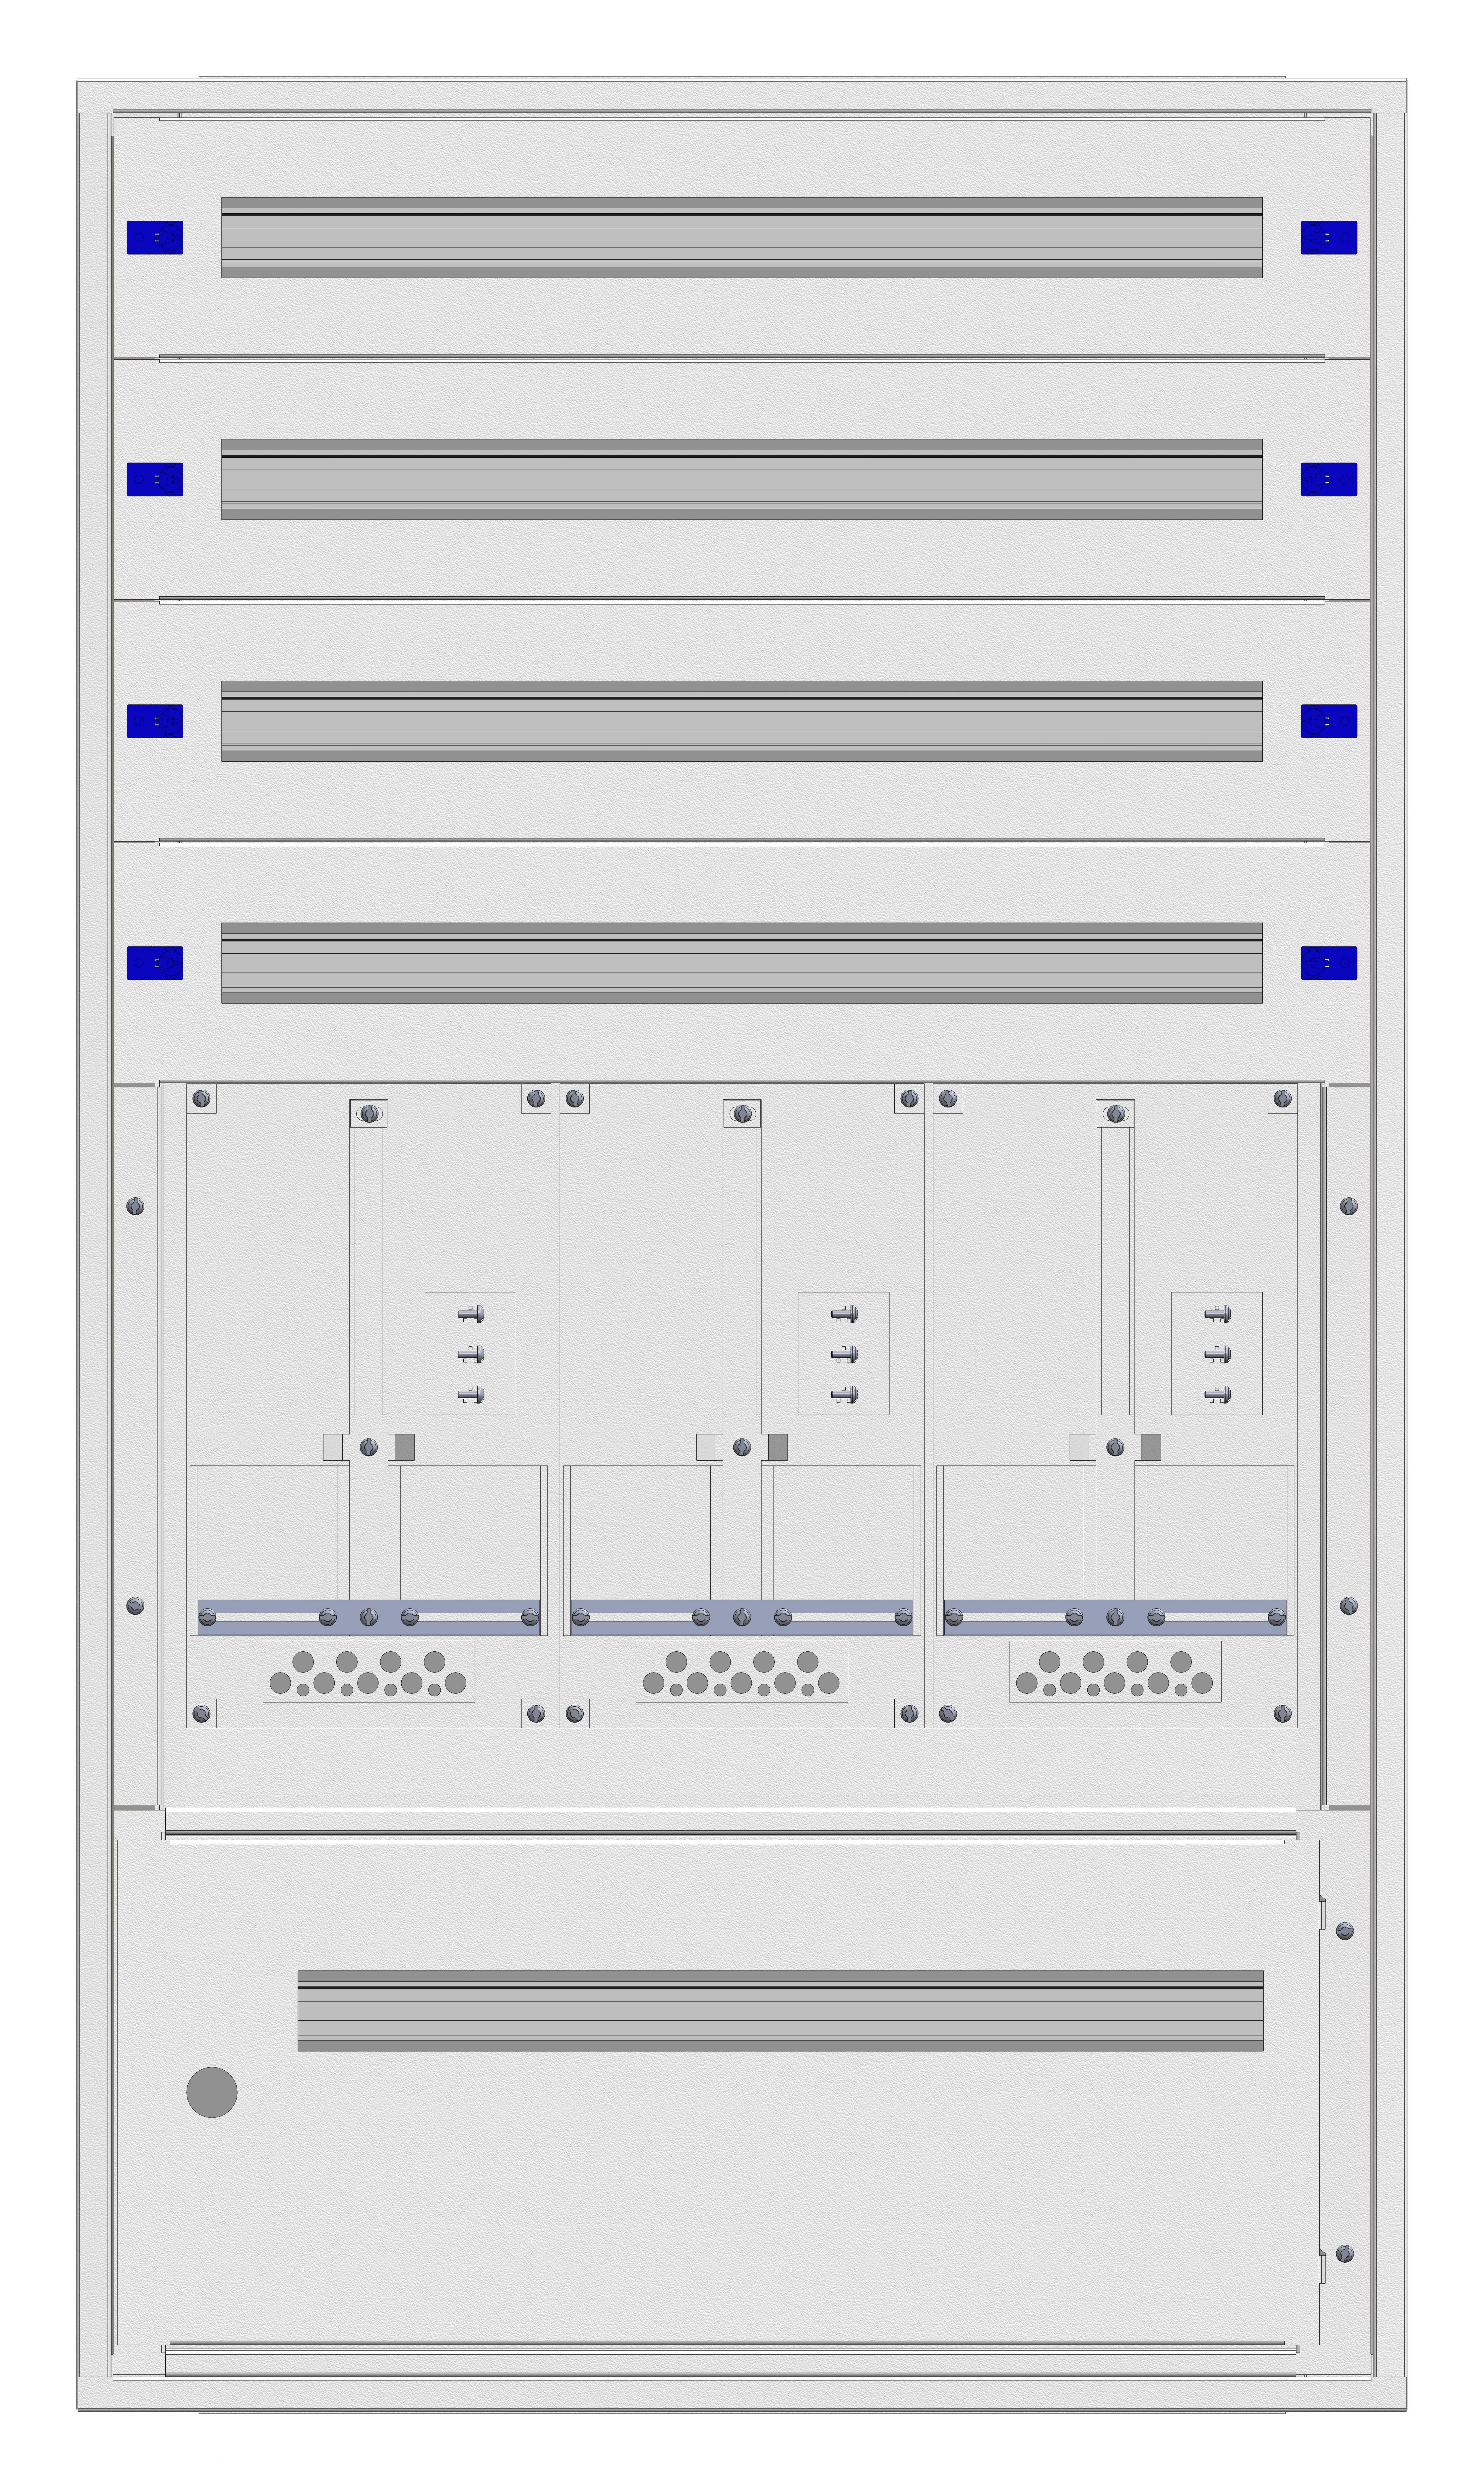 1 Stk Aufputz-Zählerverteiler 3A-28E/STMK 3ZP, H1380B810T250mm IL160328GS